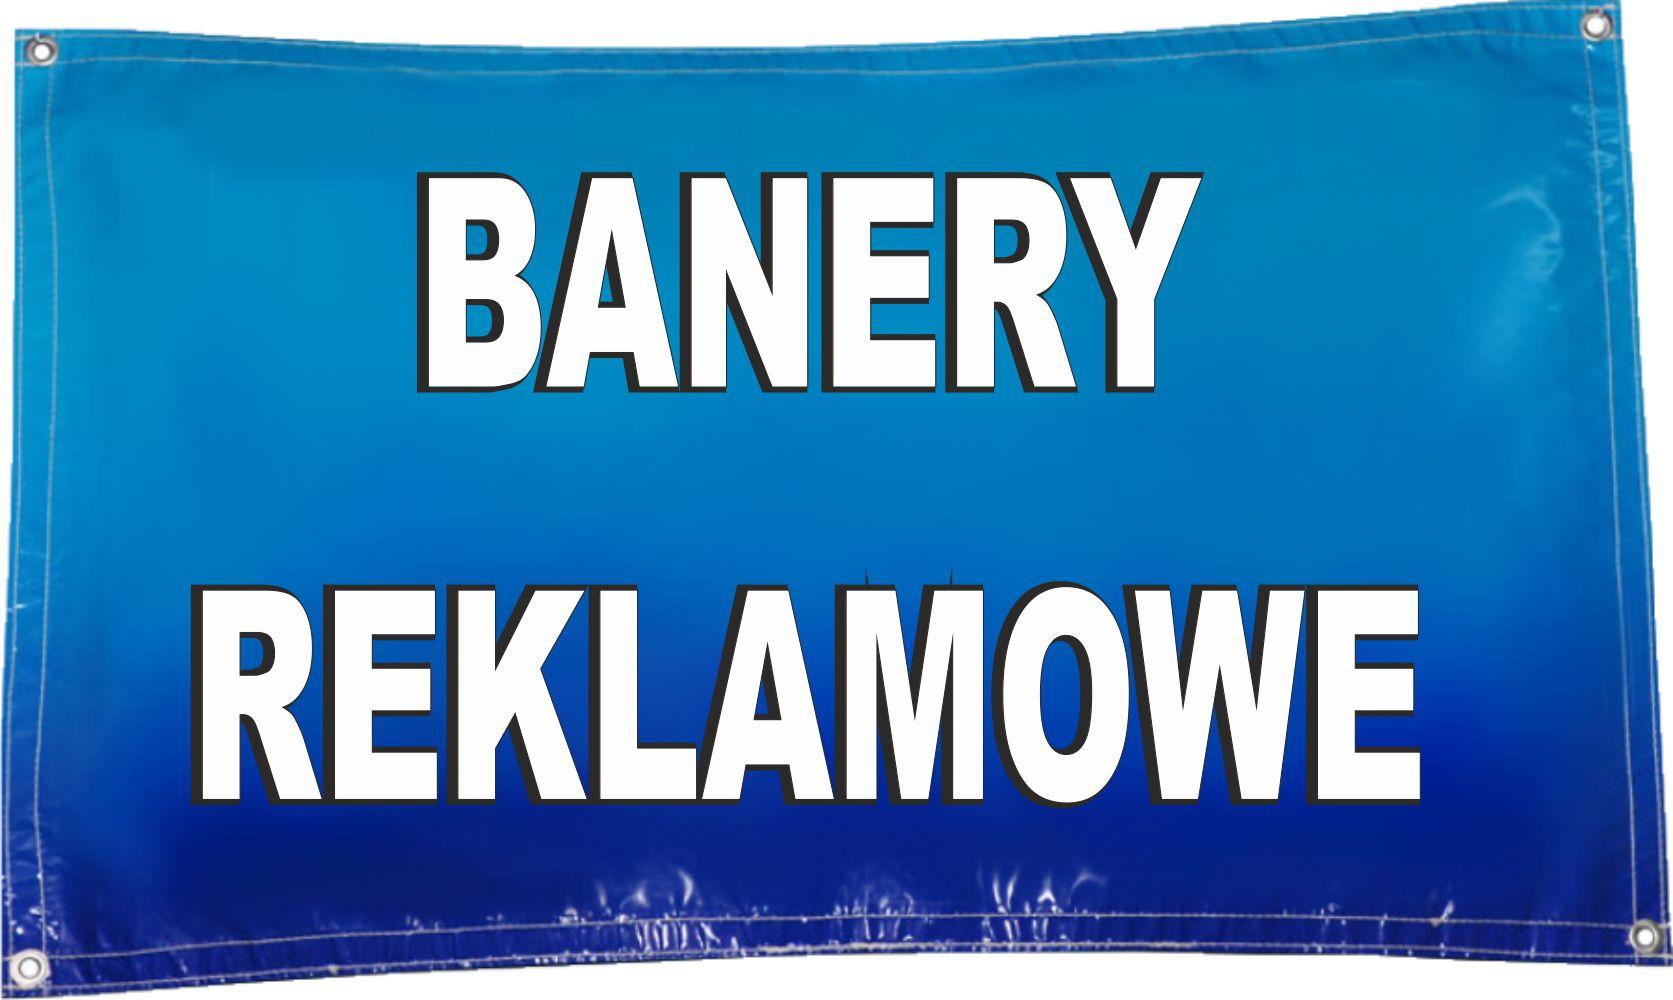 Baner Reklamowy Banery Plandeki Reklamowe Reklamy 6712986802